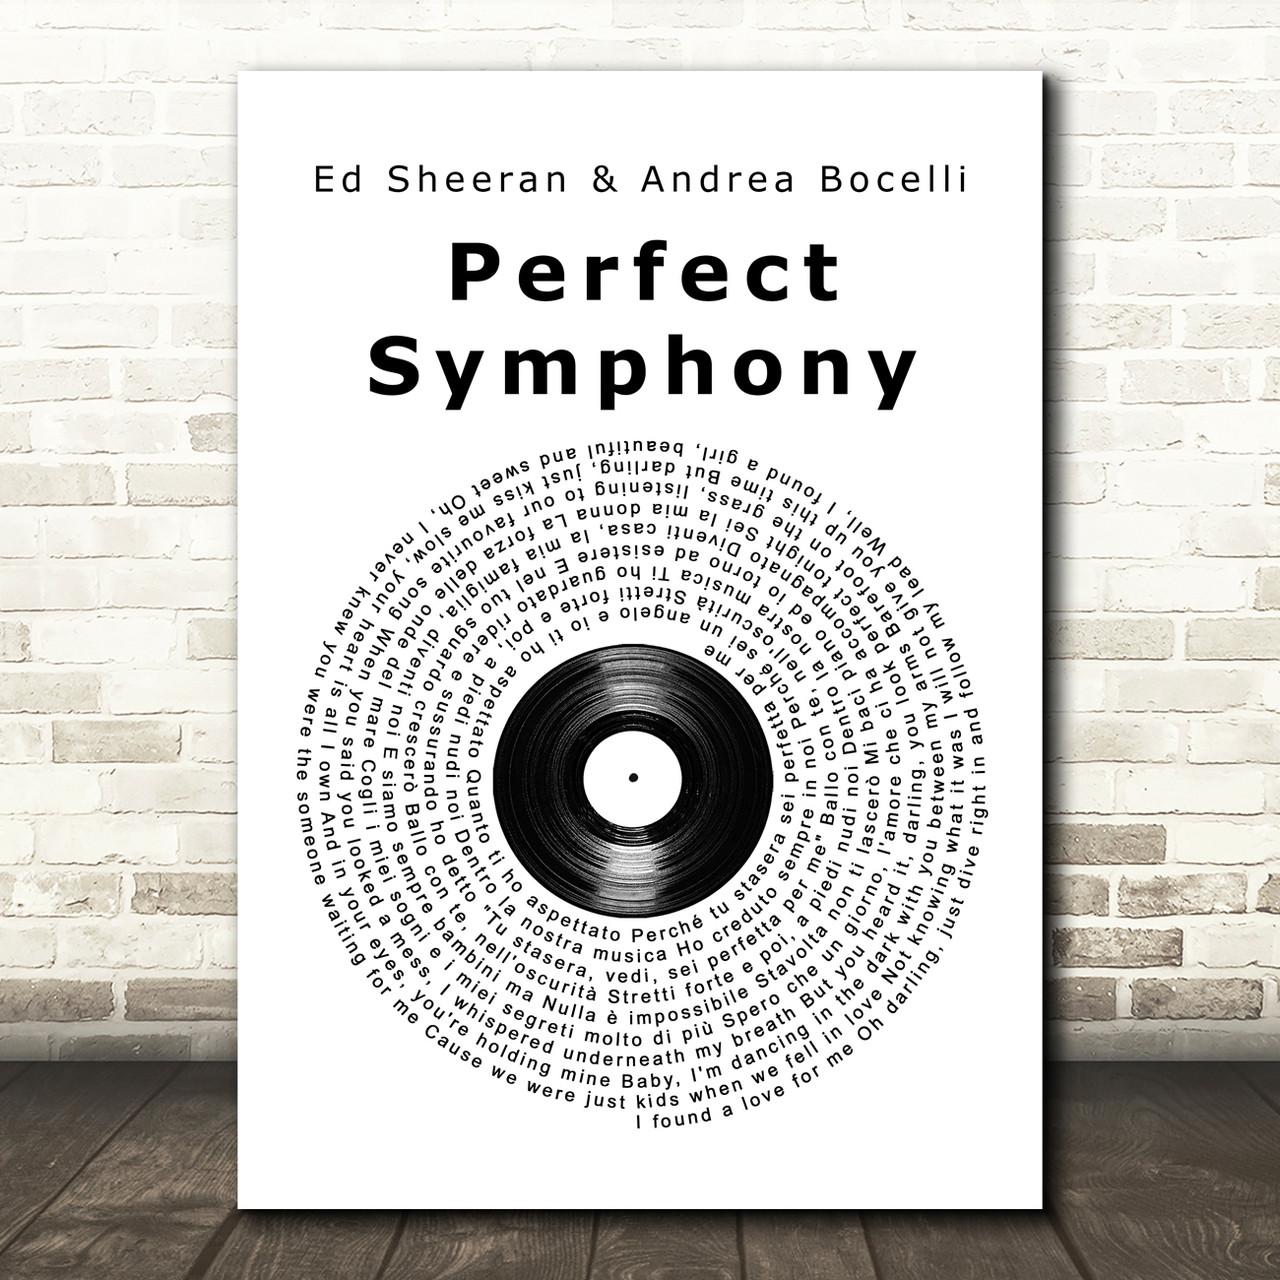 Ed Sheeran & Andrea Bocelli Perfect Symphony Vinyl Record Song Lyric Art  Print